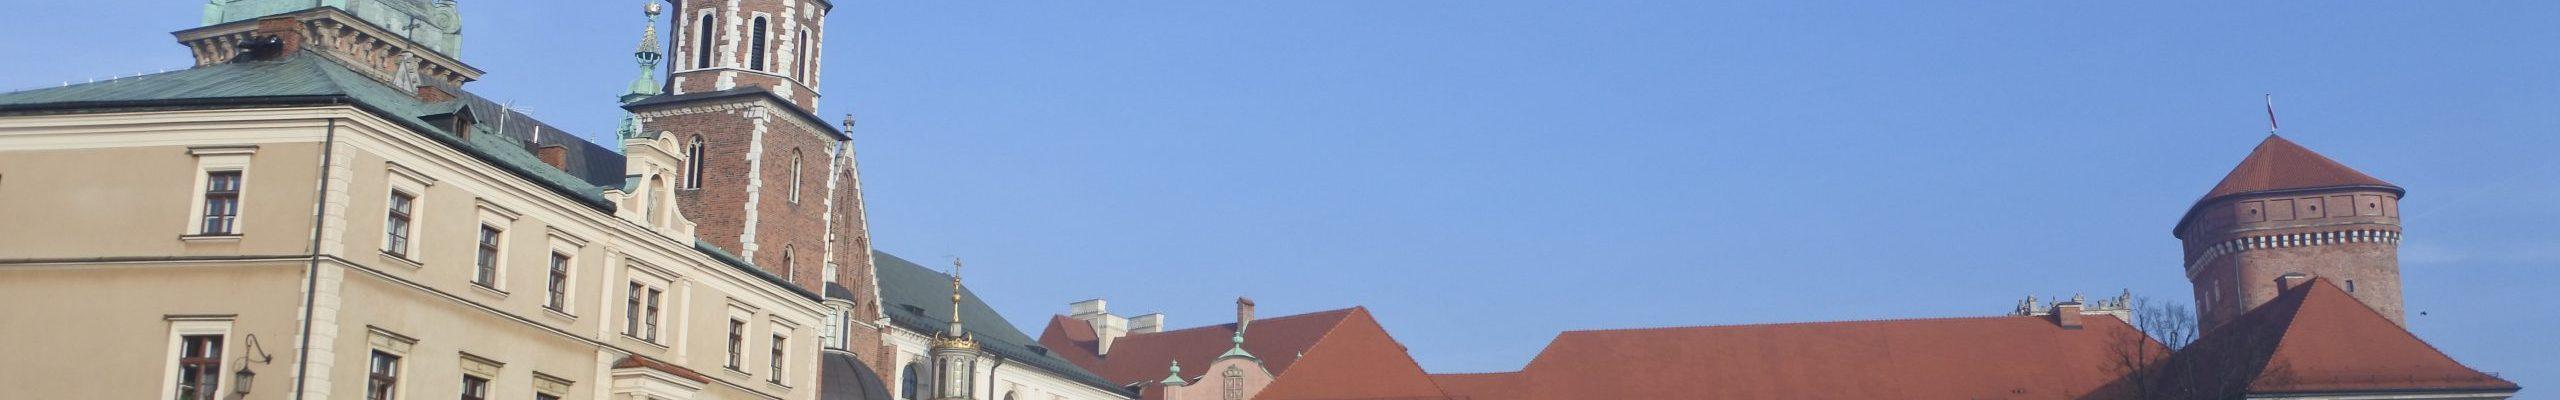 Goedkope city trip naar Krakau polen